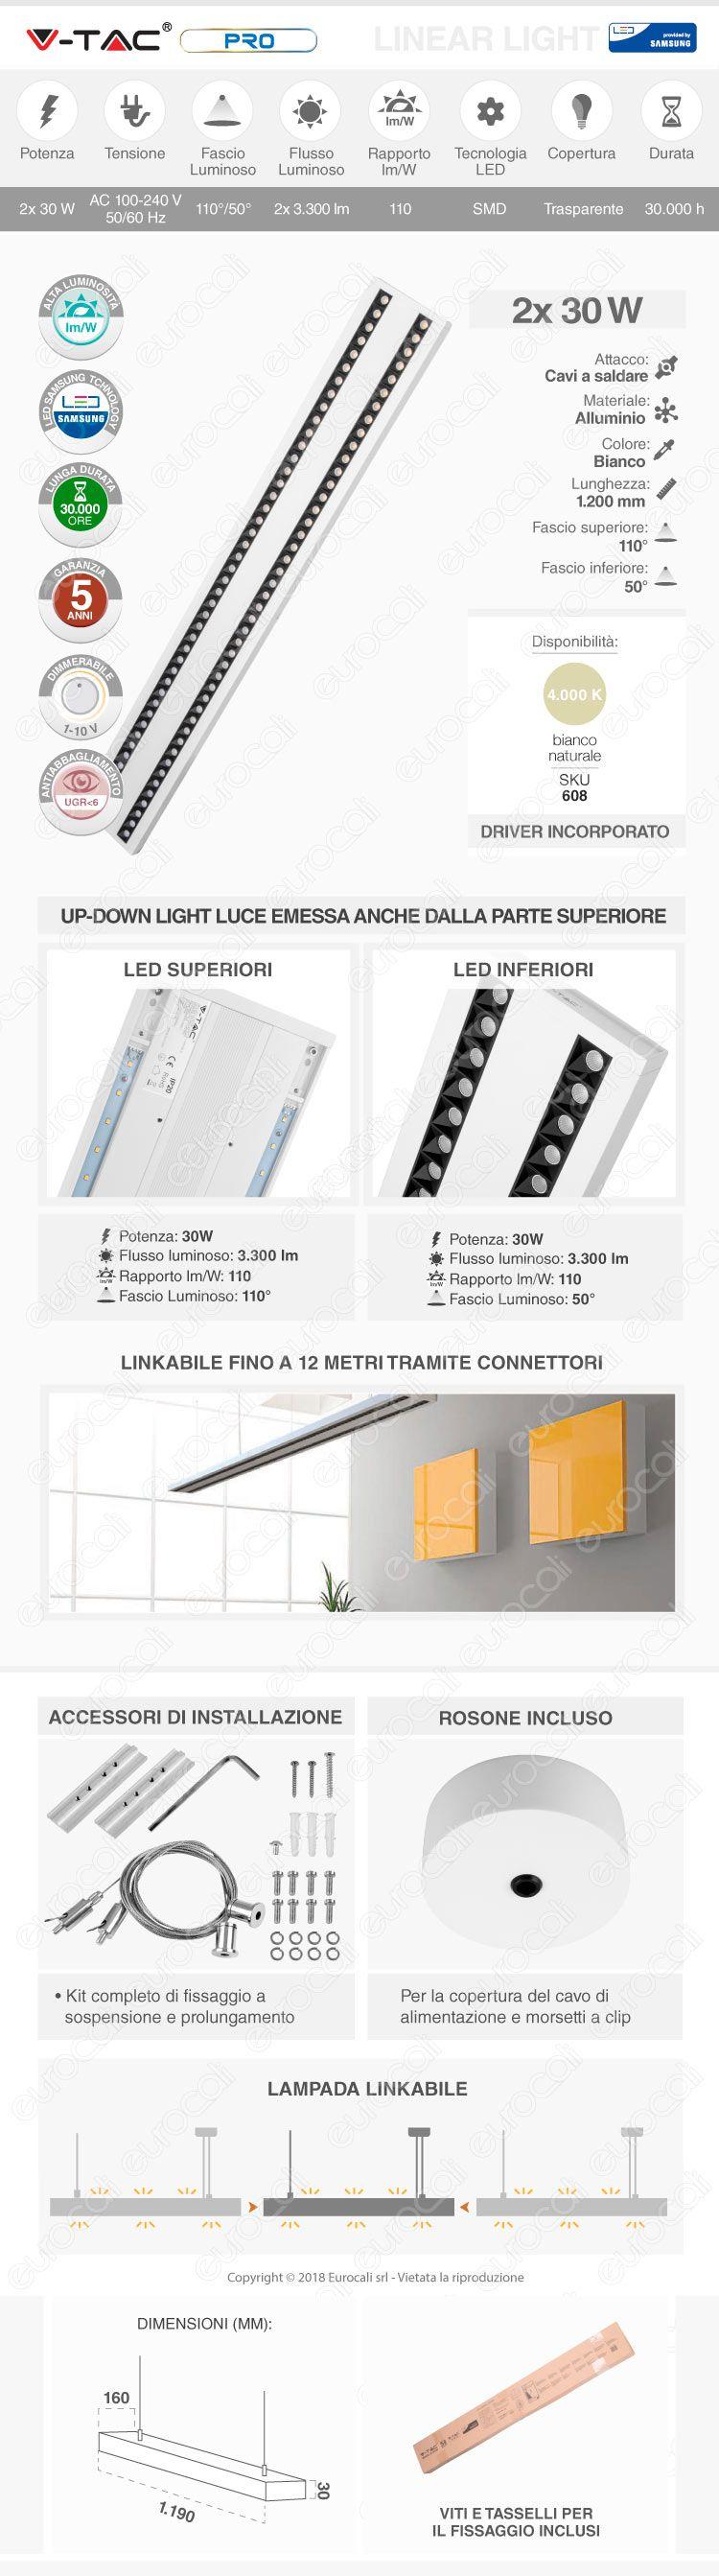 Lampada LED a Sospensione Linear Light 60W Chip Samsung White Body Dimmerabile V-Tac PRO VT-7-62